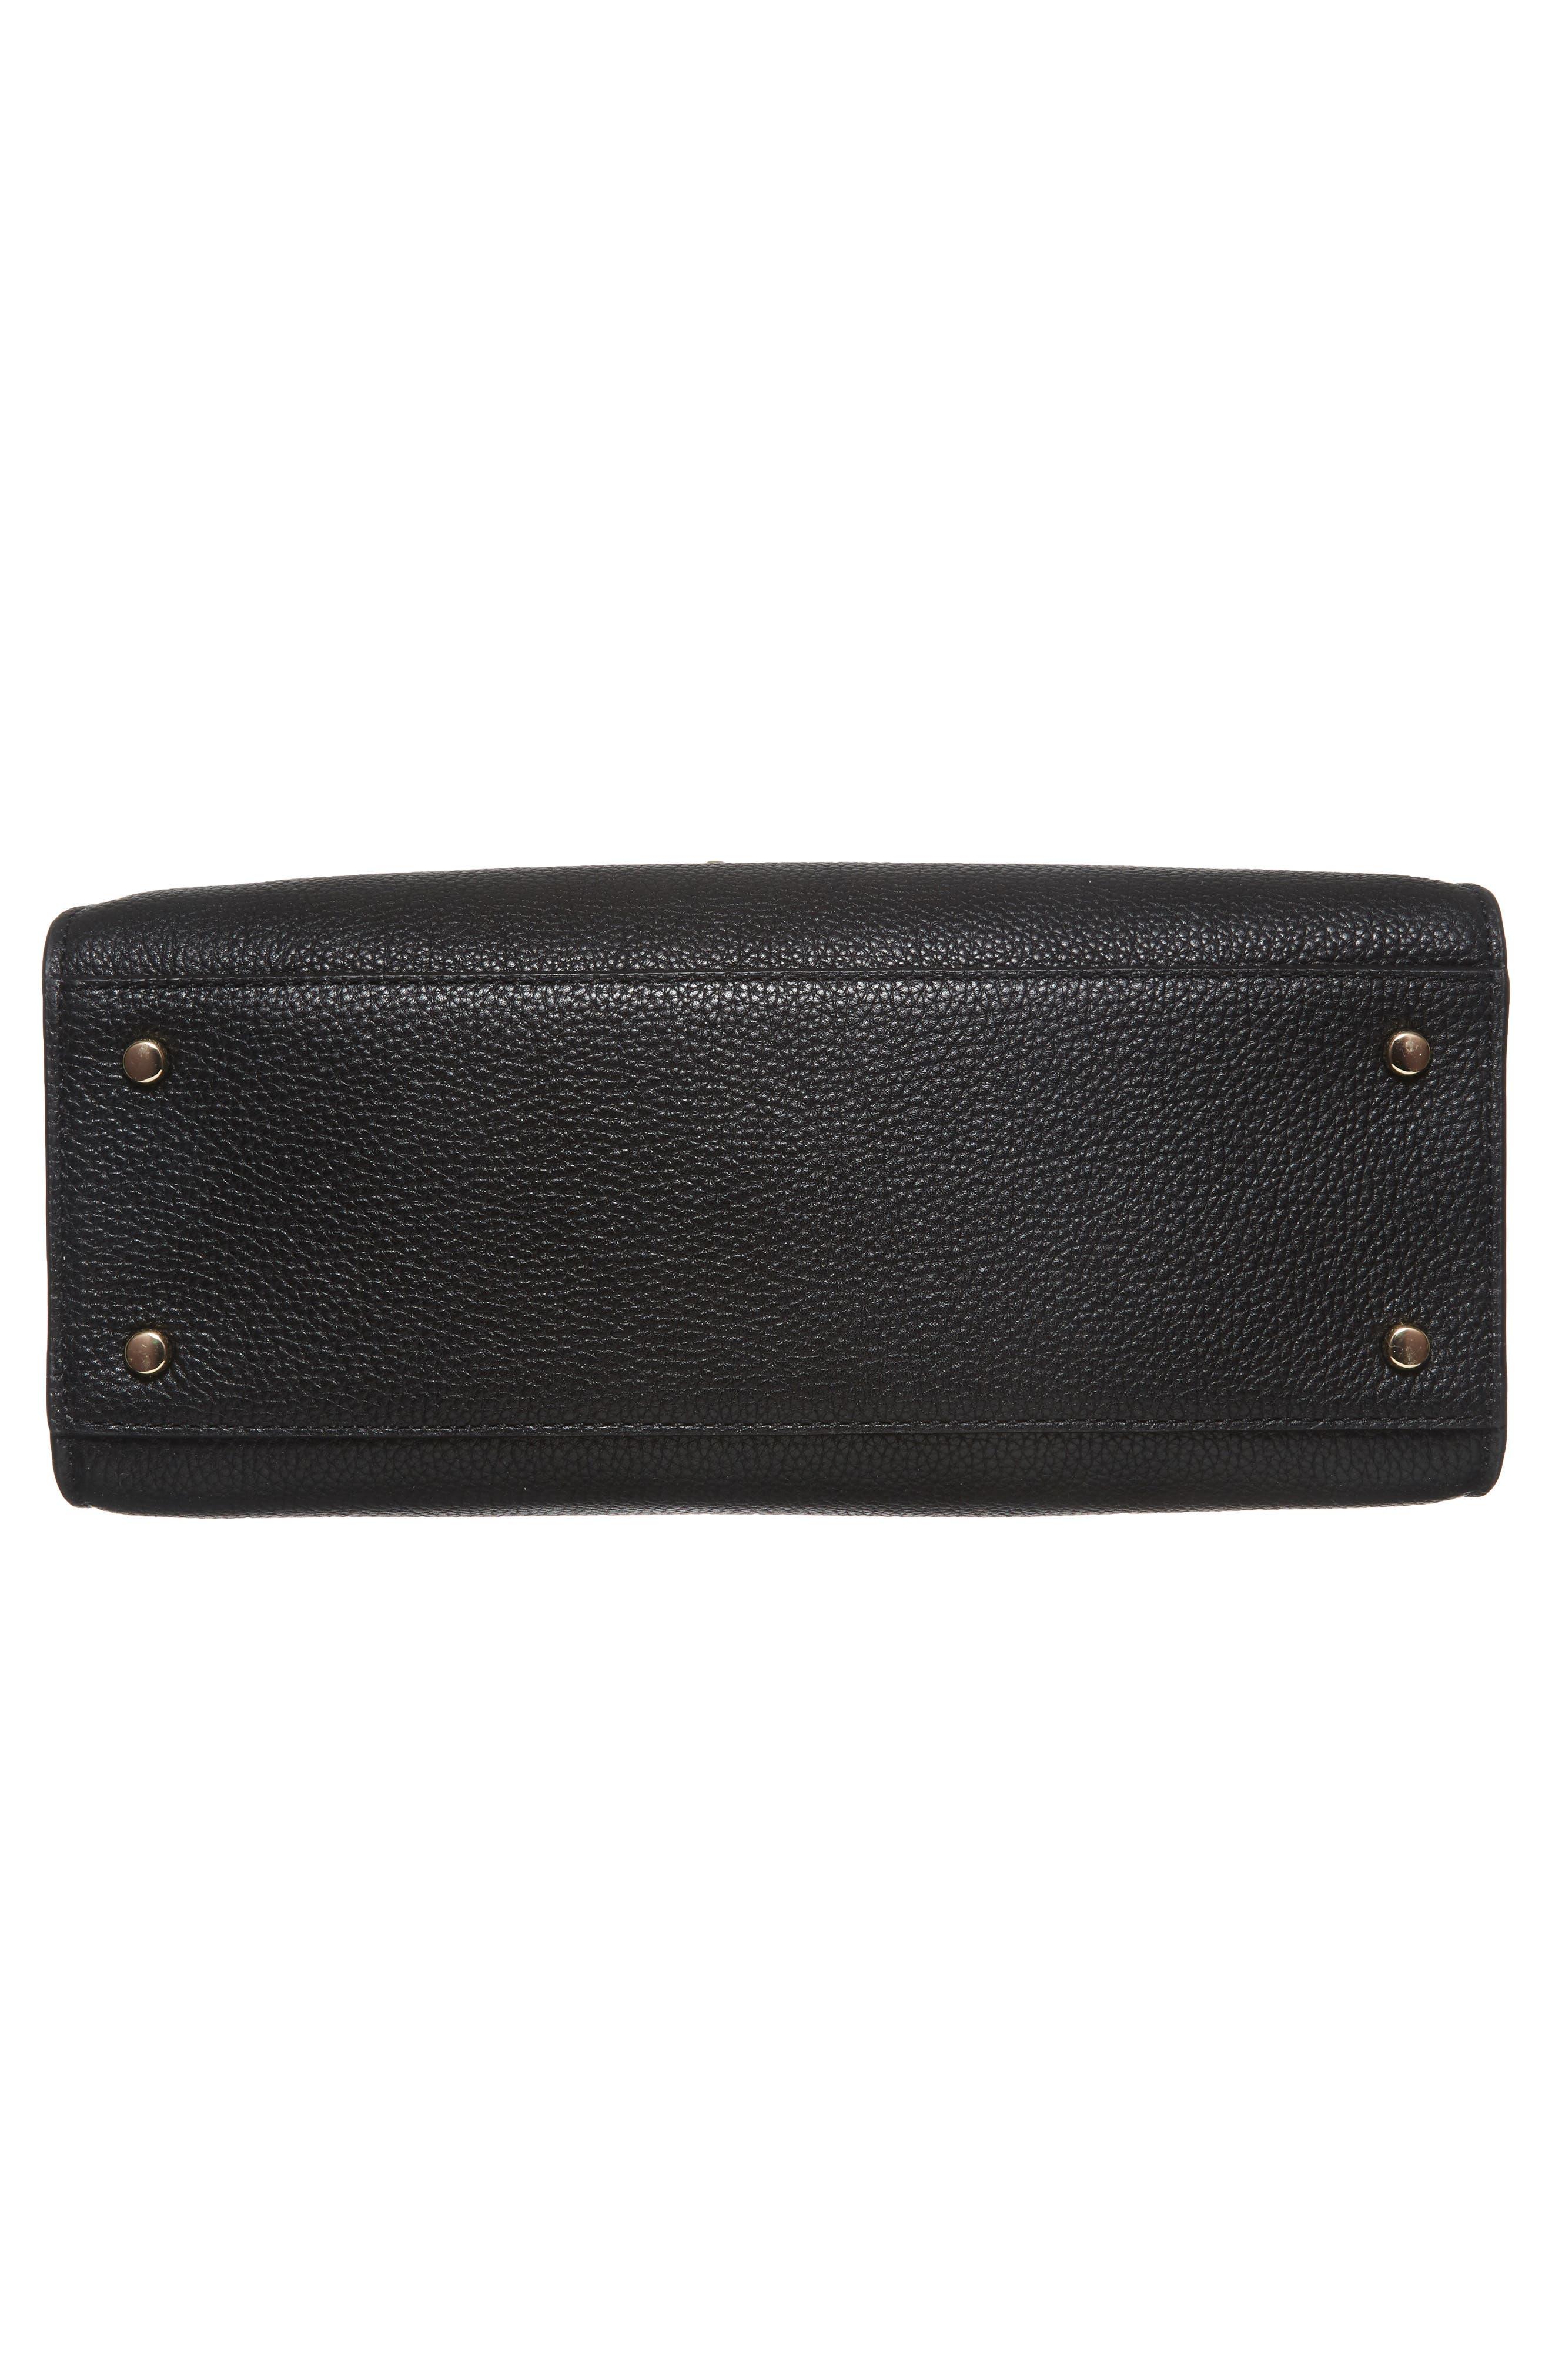 stewart street - samira textile & leather top handle satchel,                             Alternate thumbnail 5, color,                             Multi